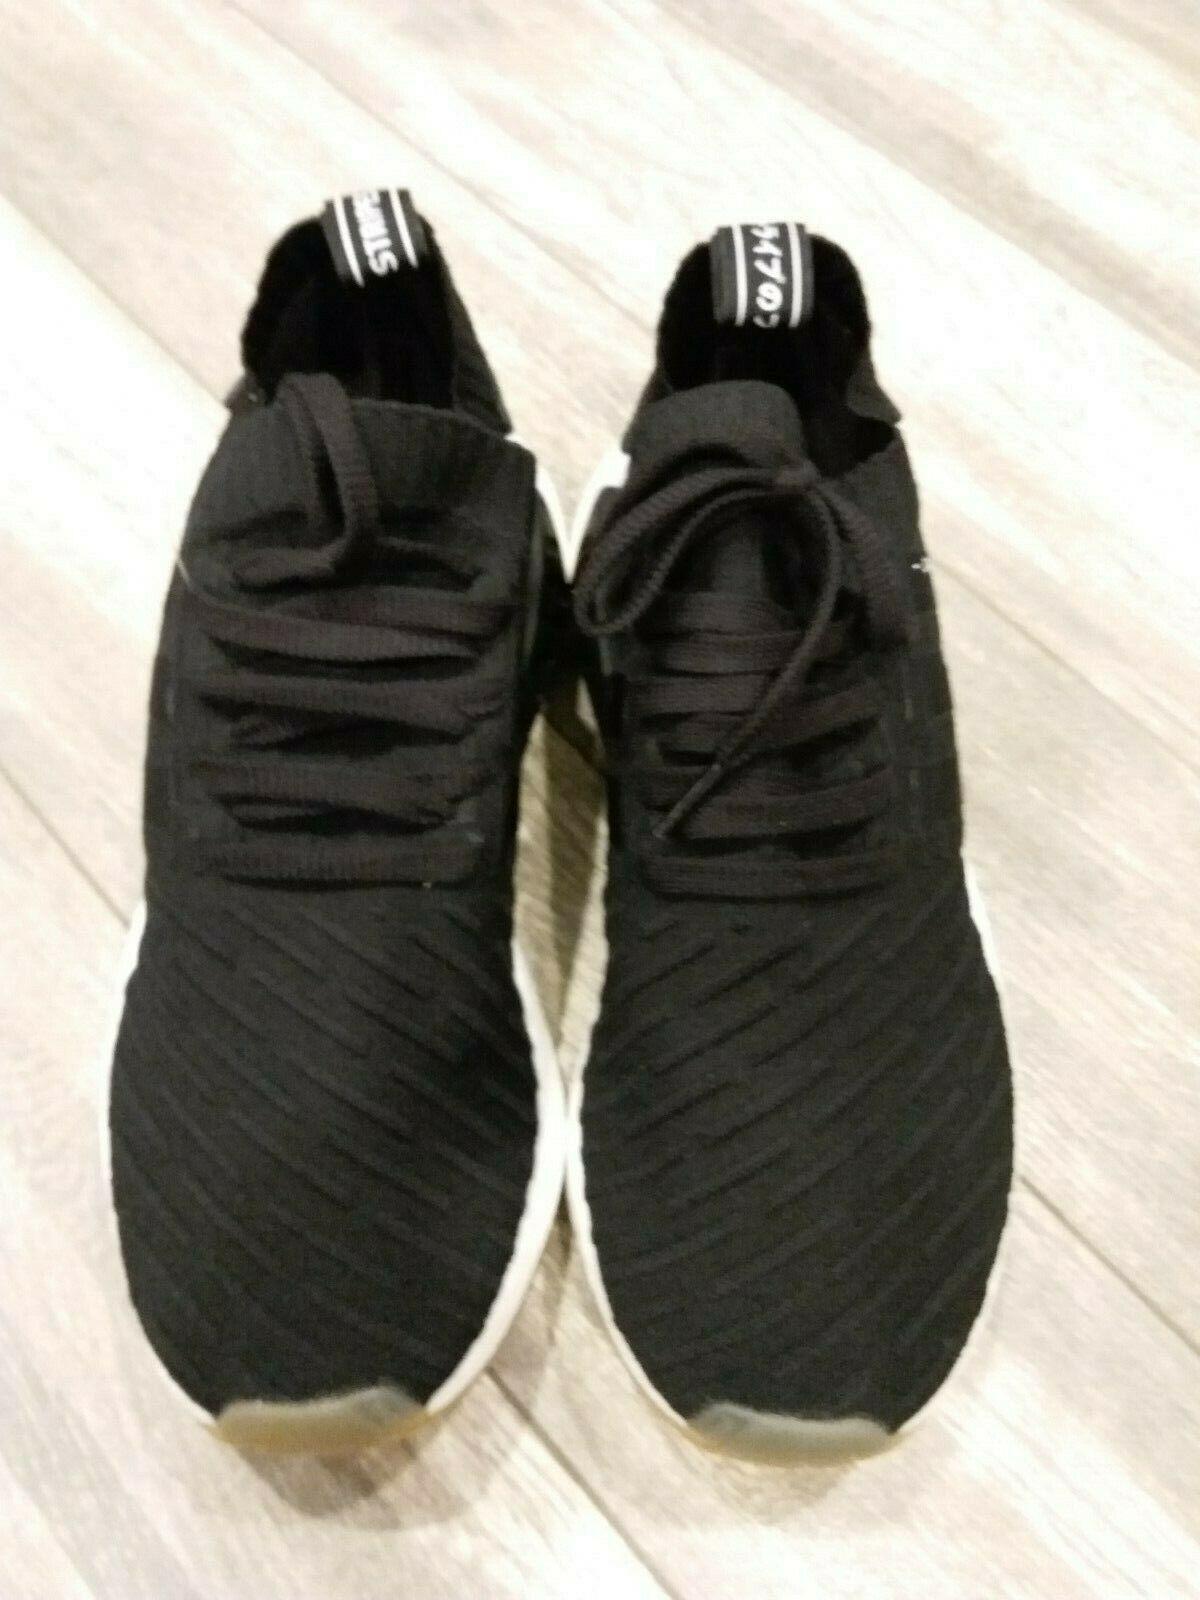 f13b66130 New Adidas NMD R2 Primeknit Japan Black Gym Running Shoes (BY9696) Size 10